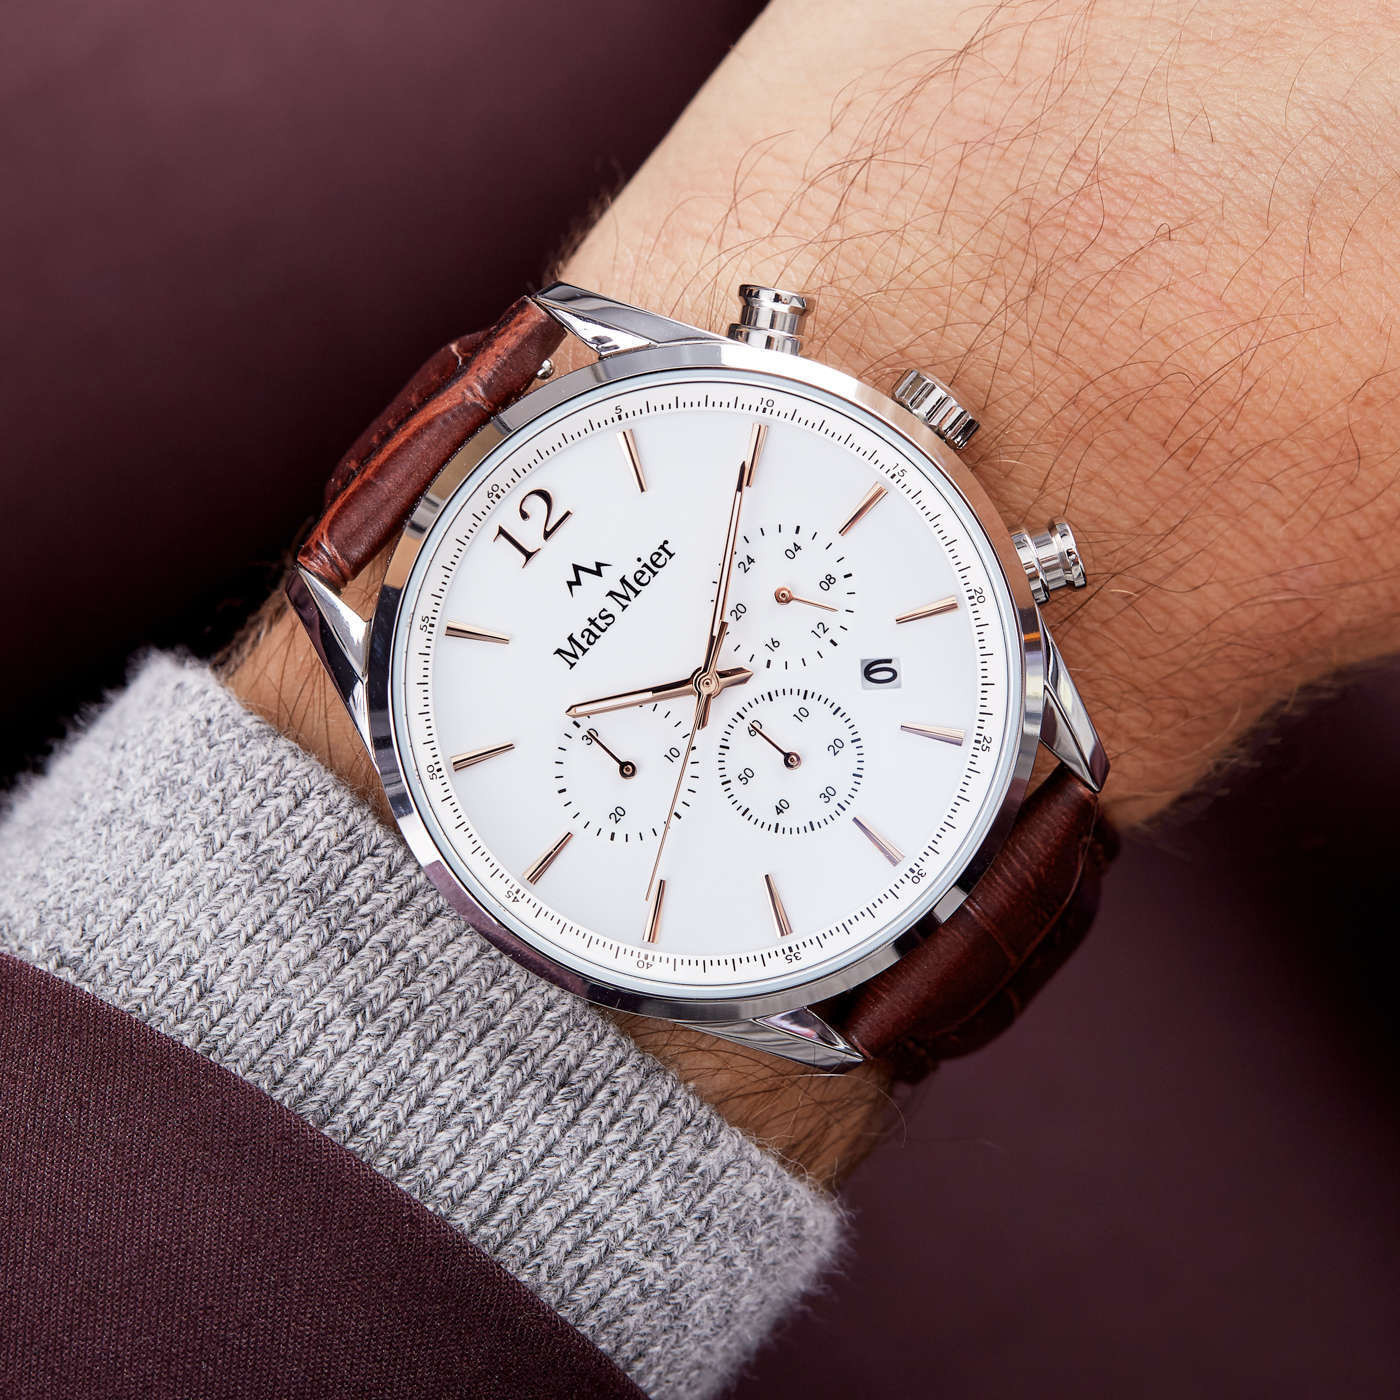 Mats Meier Grand Cornier montre chronographe blanc / marron